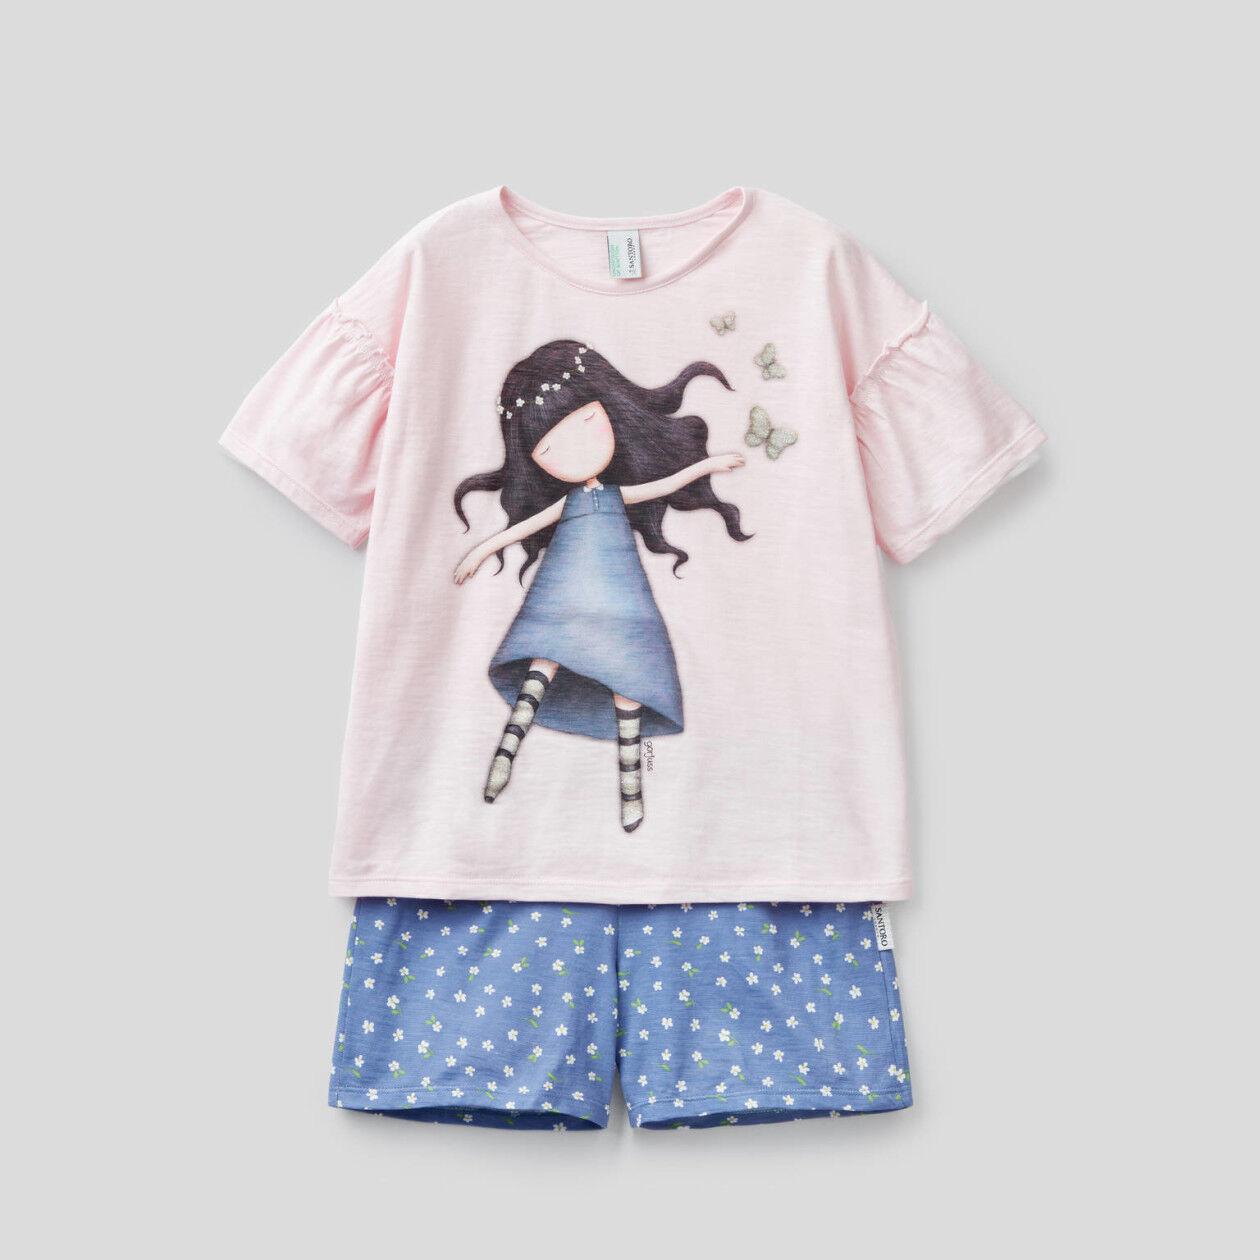 Short pyjamas with Gorjuss print